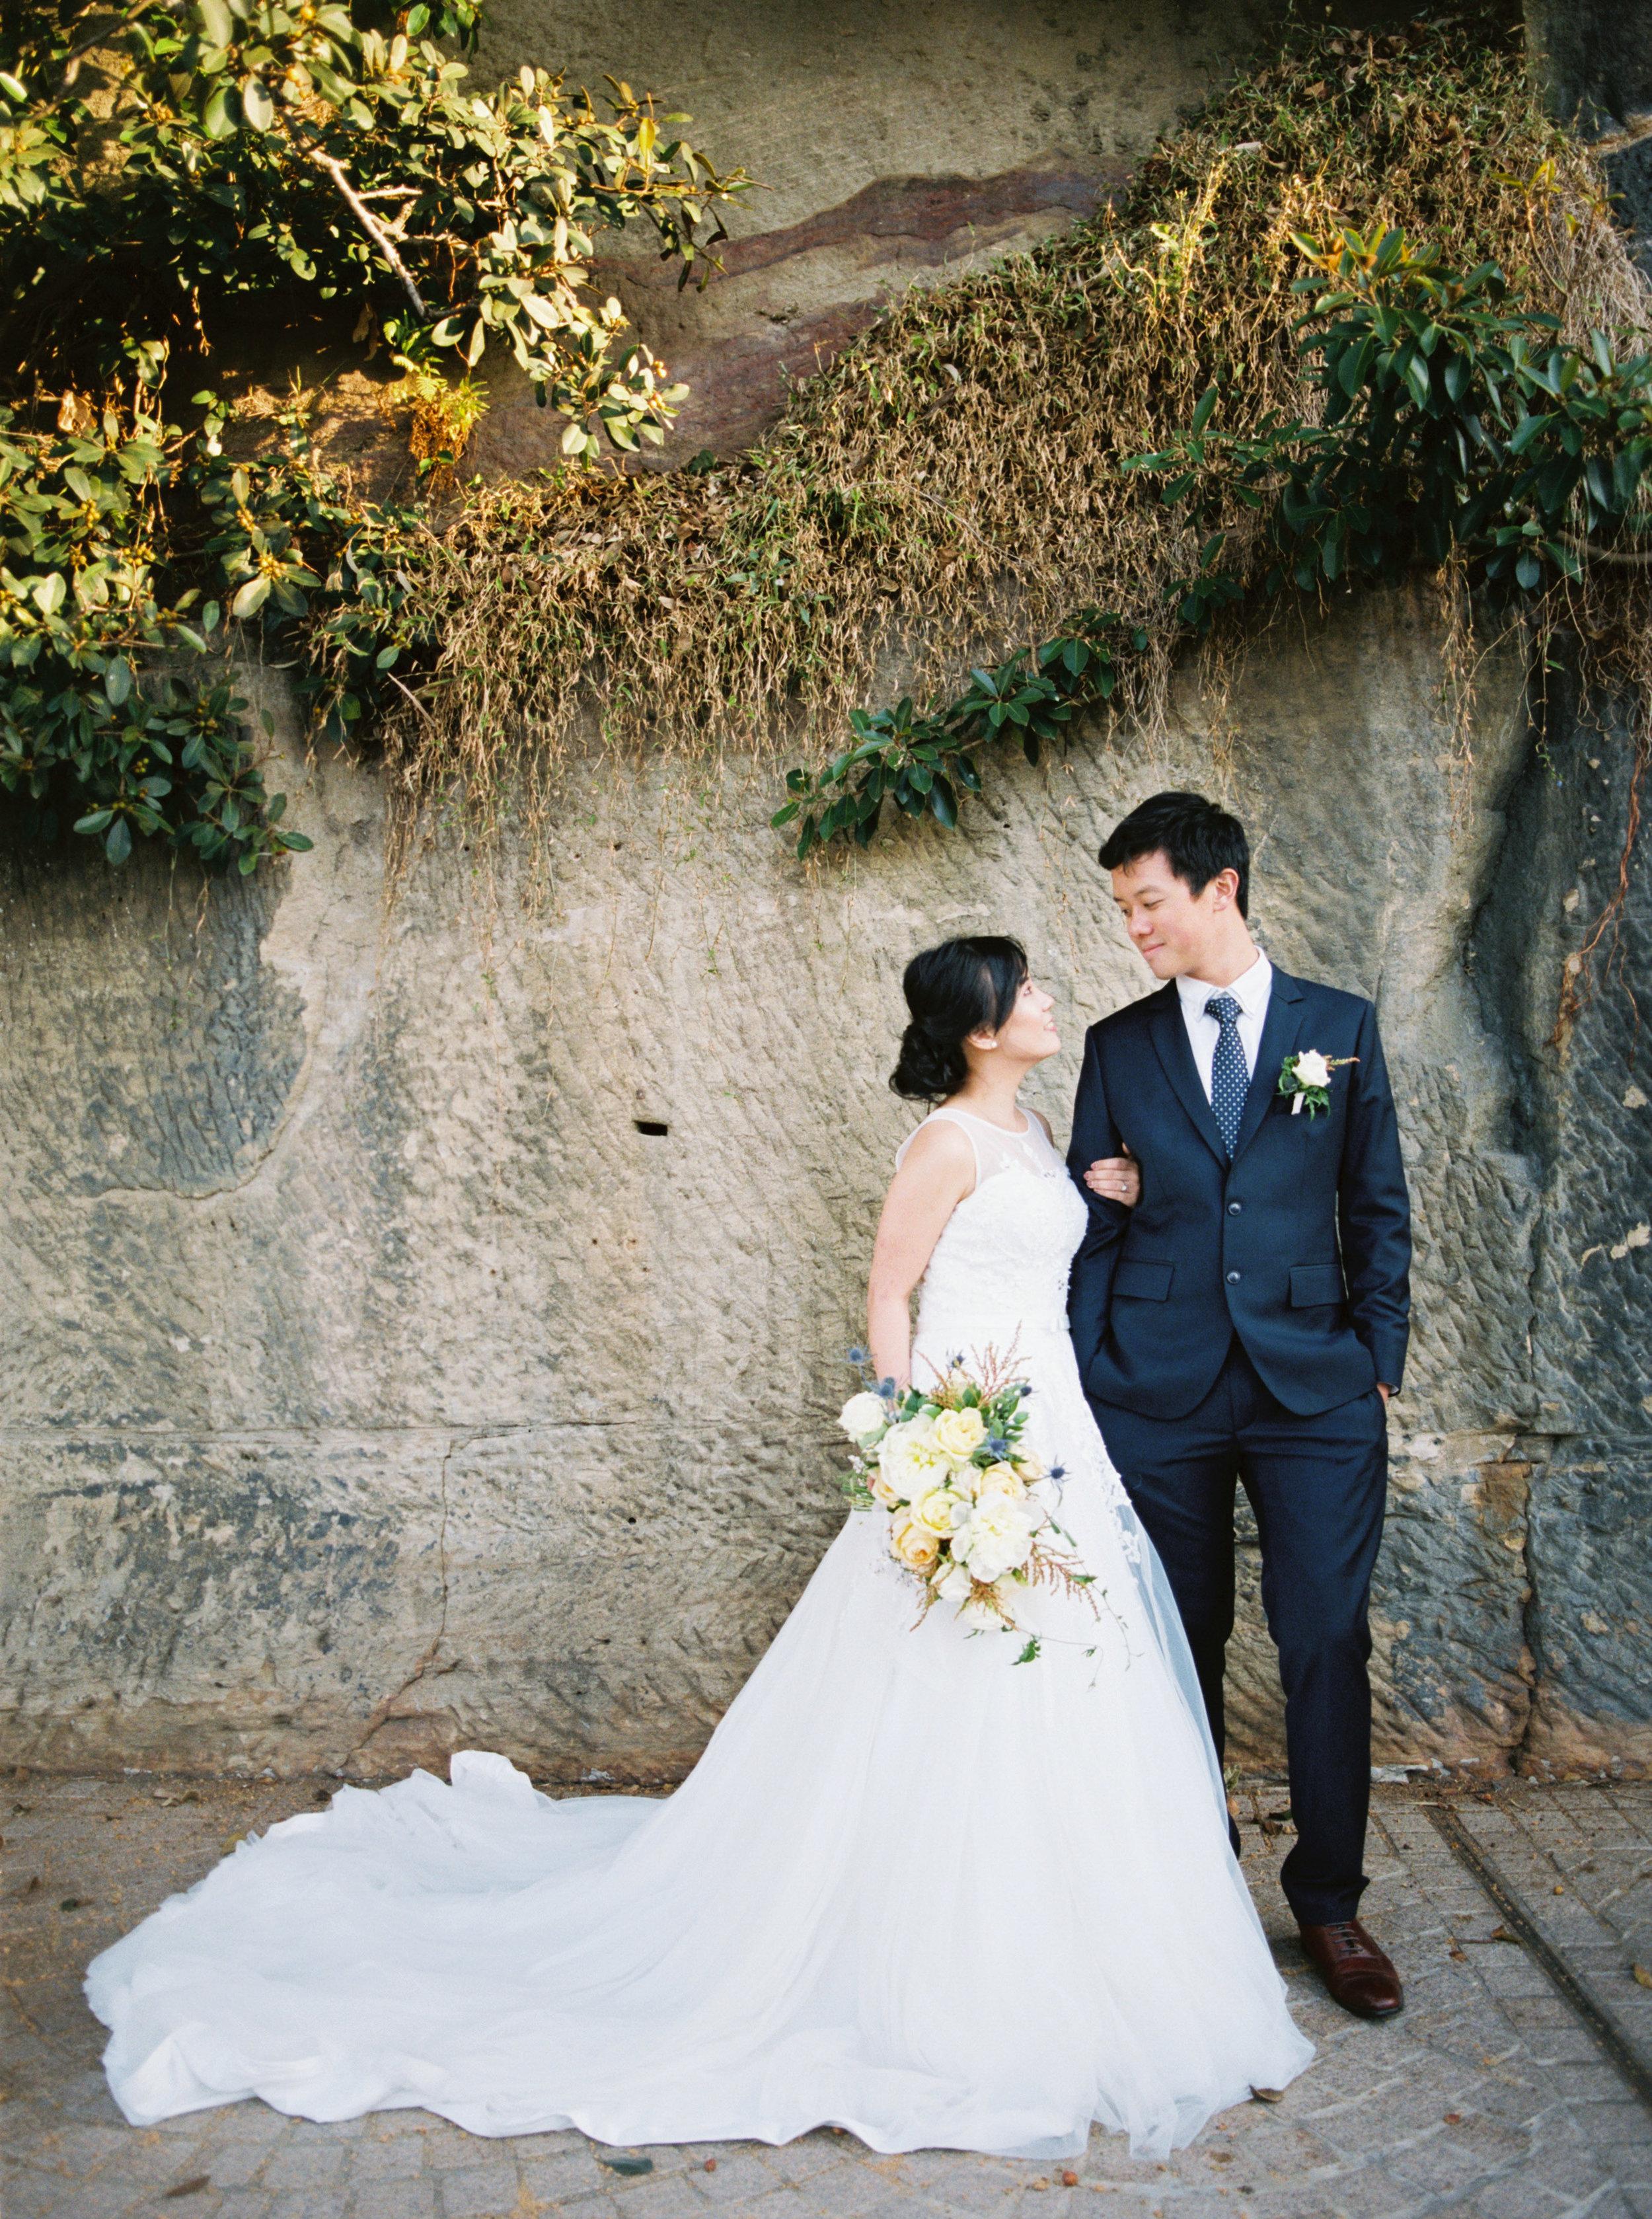 00012- Australia Sydney Wedding Photographer Sheri McMahon.jpg